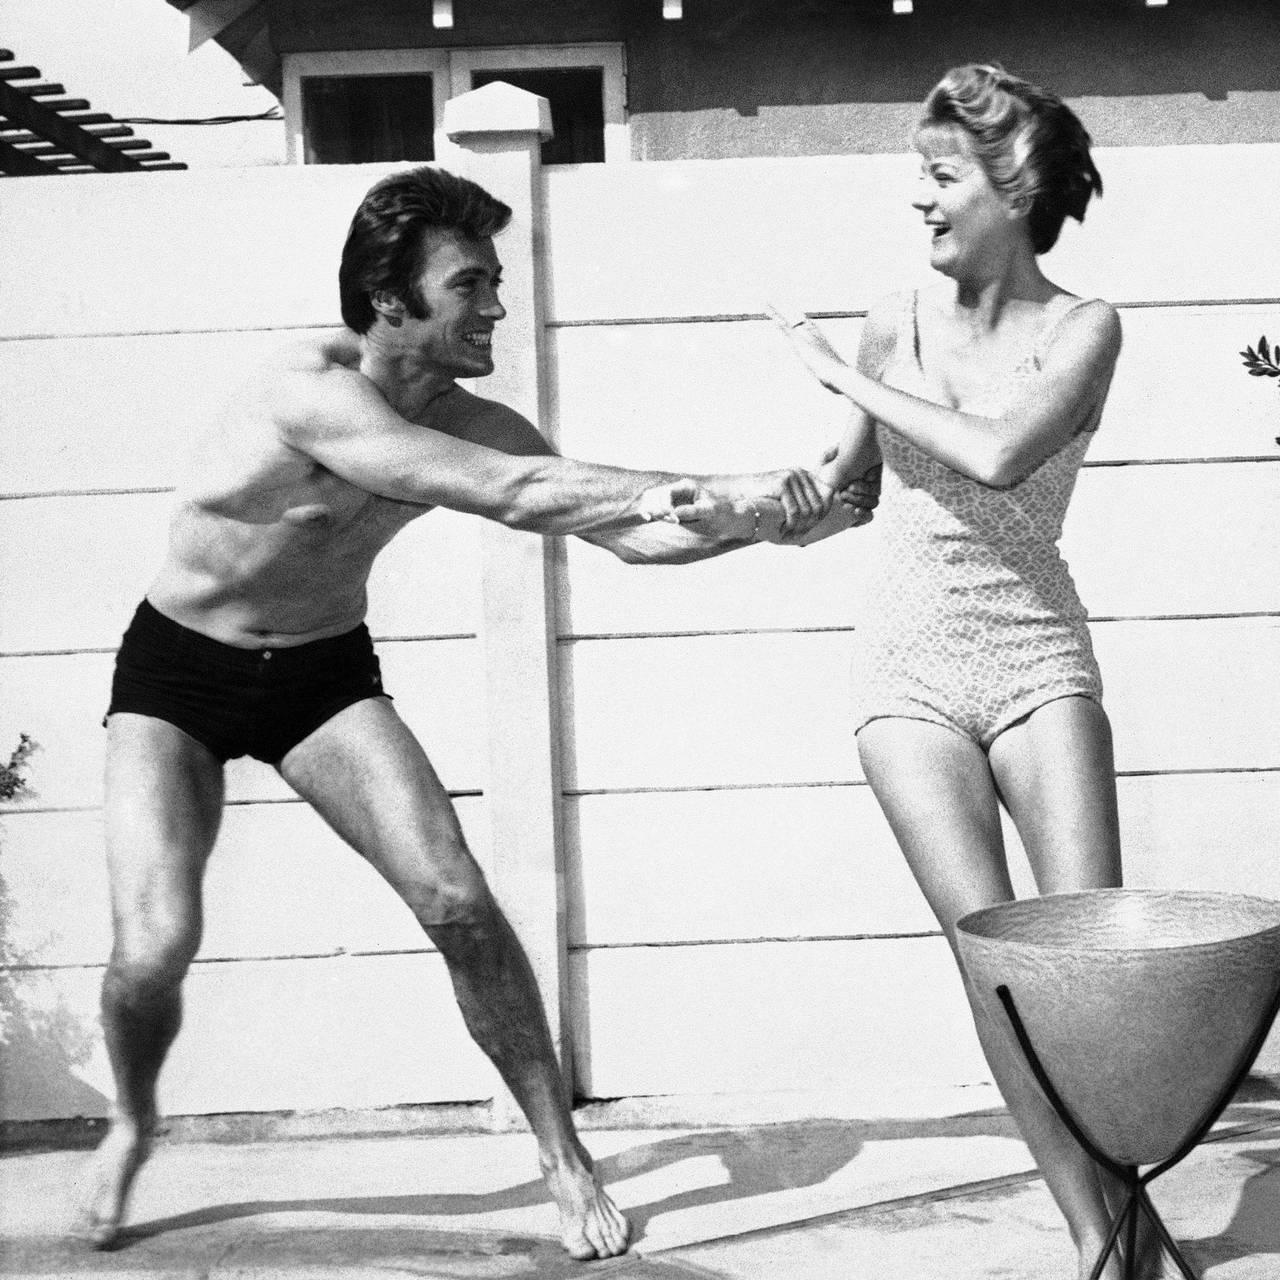 Clint og kona Maggie fra en hjemme hos-reportasje i 1960.